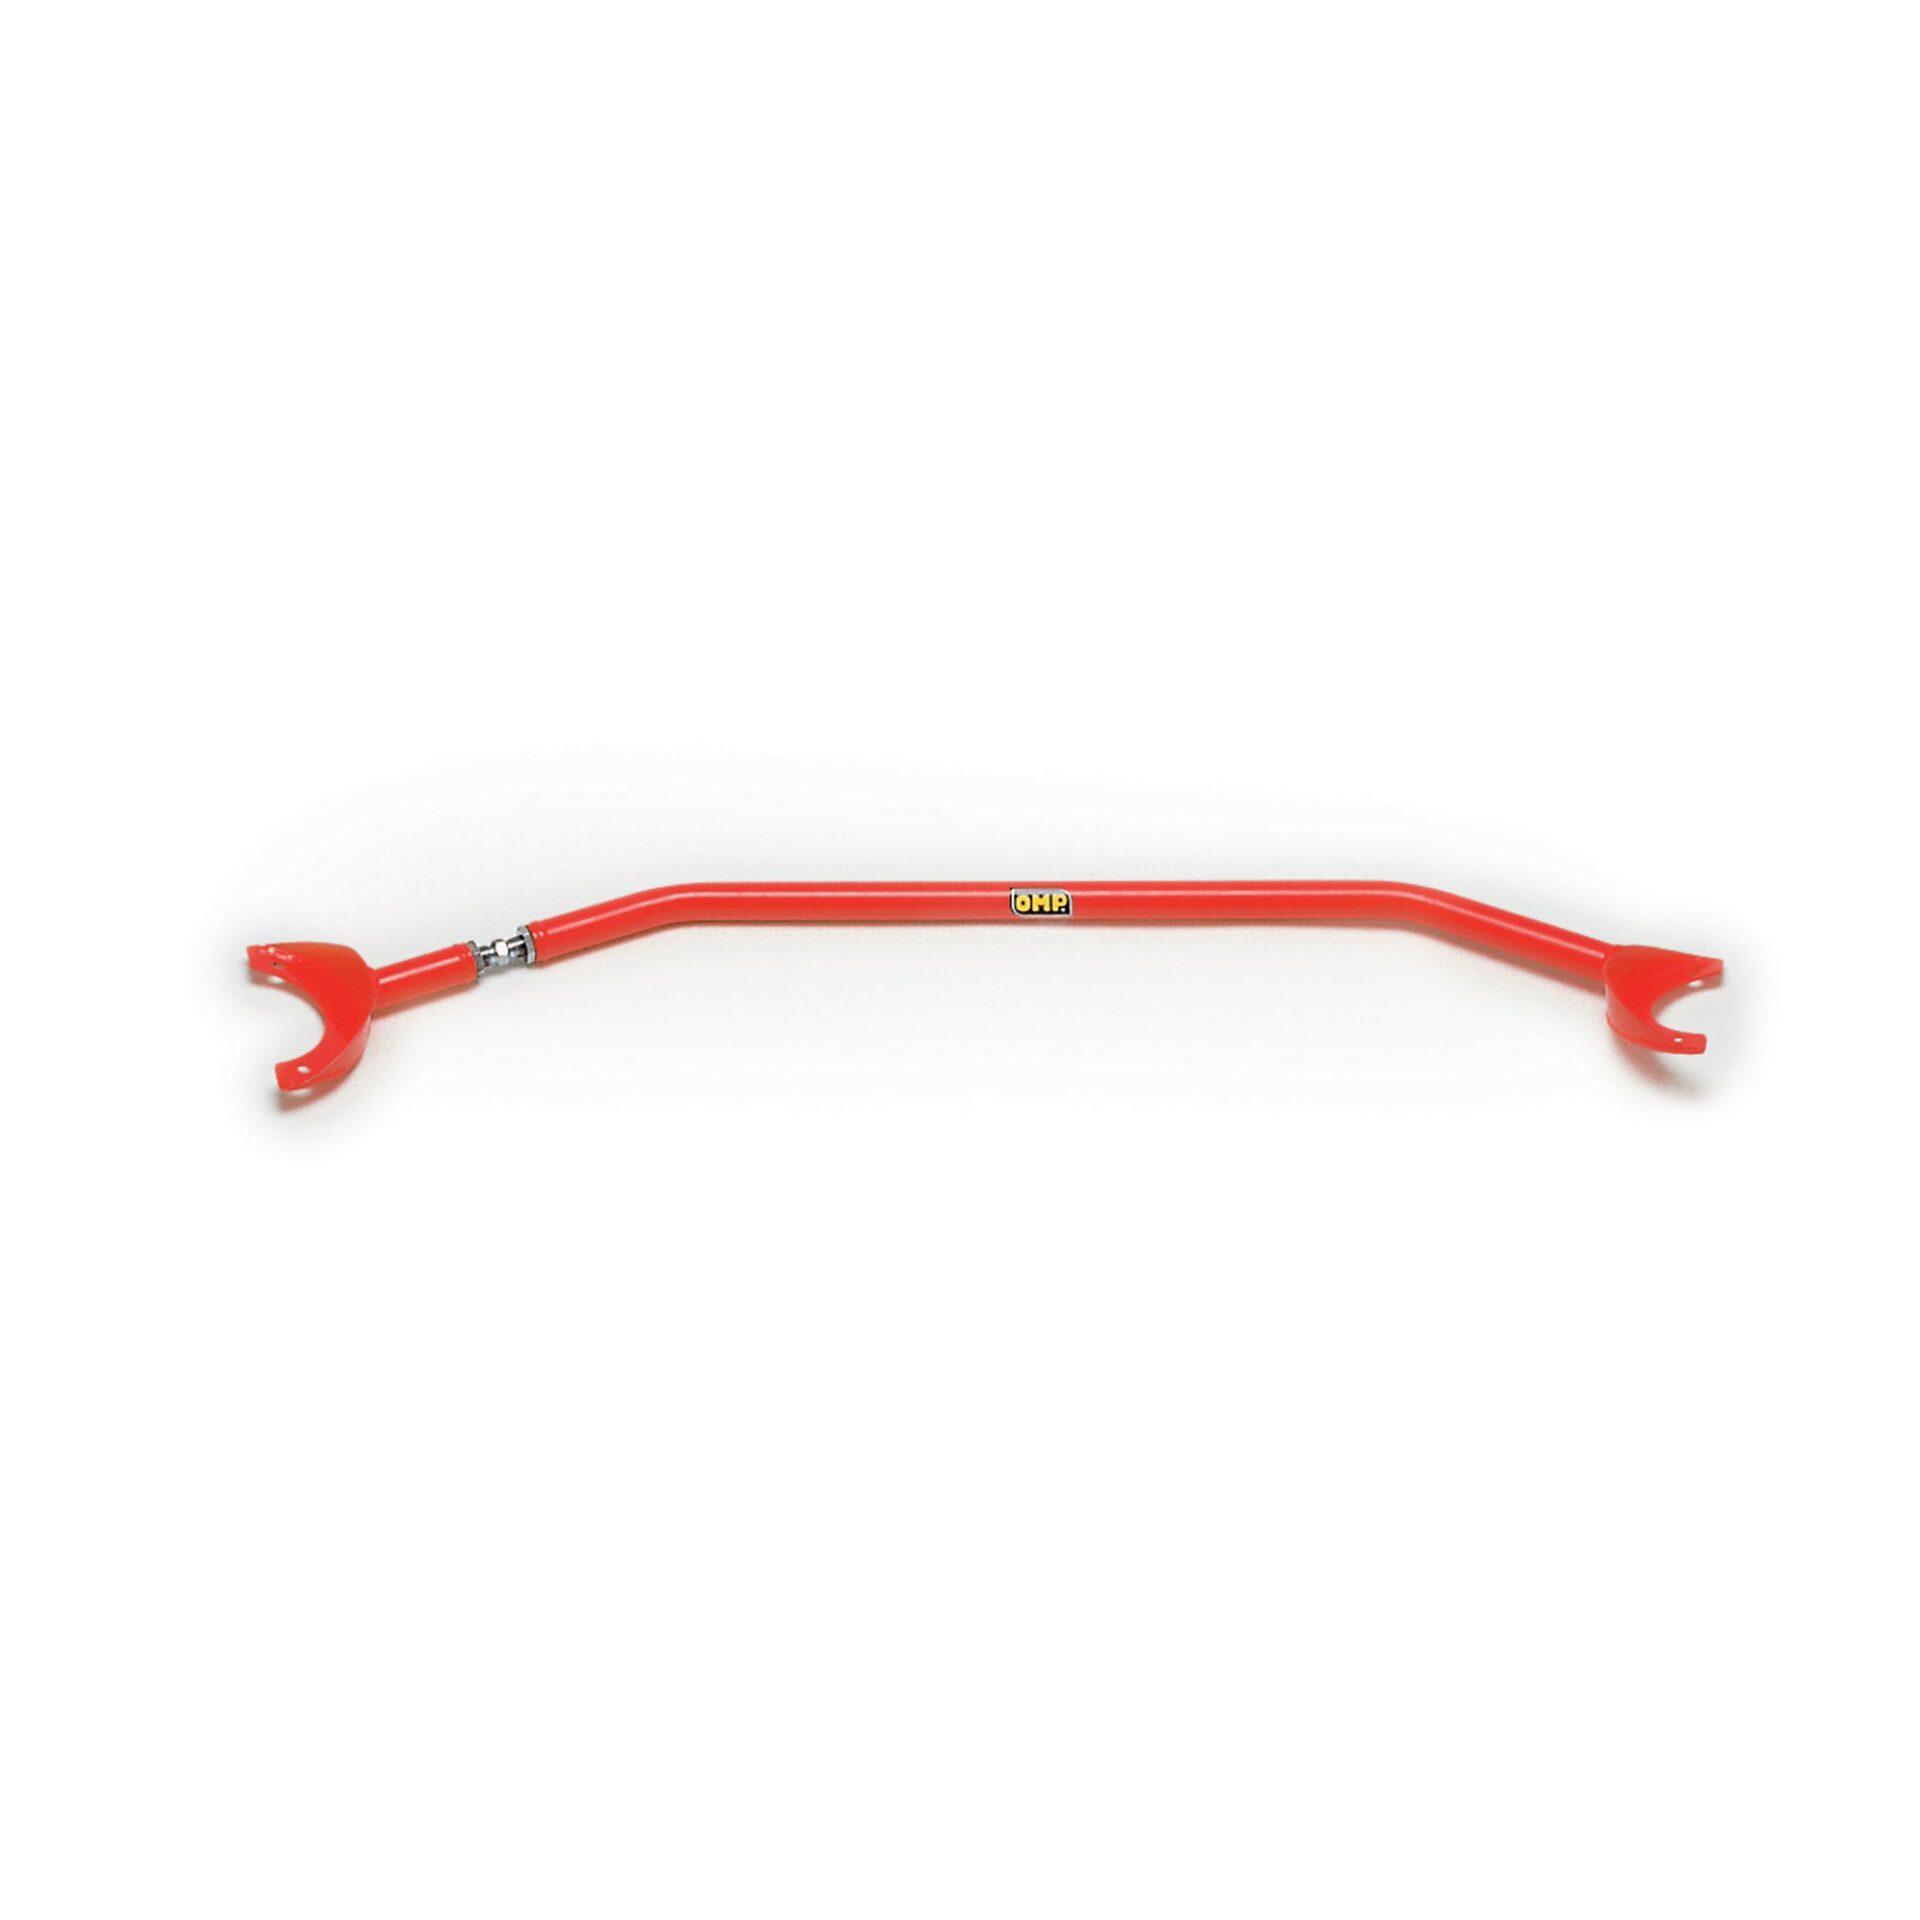 Barra duomi Subaru Impreza 2.0 16v Turbo 4WD (